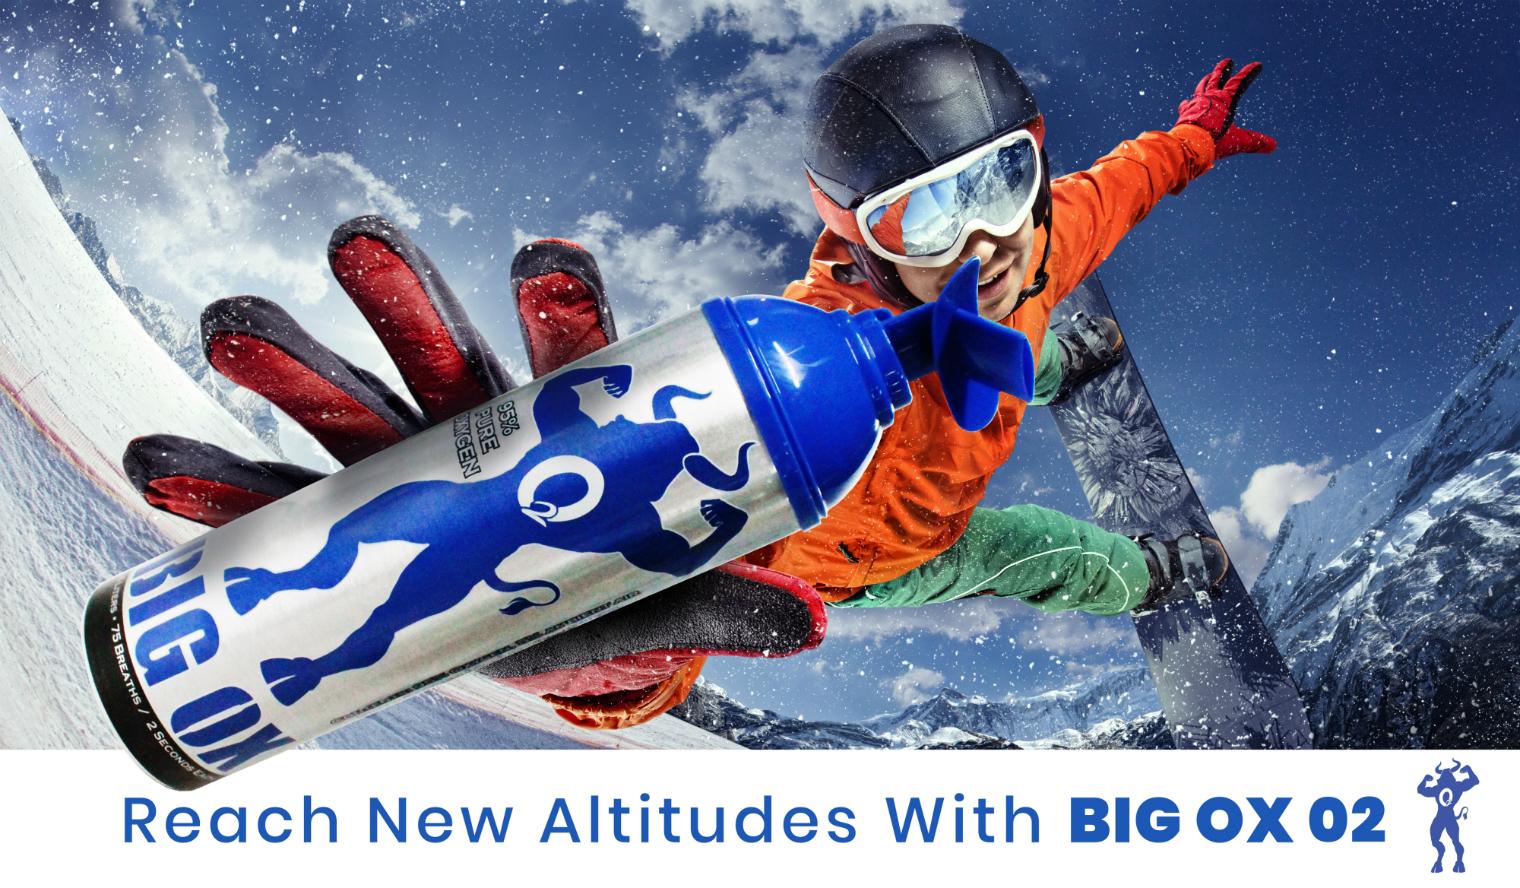 BigOX Snowboard_small.jpg